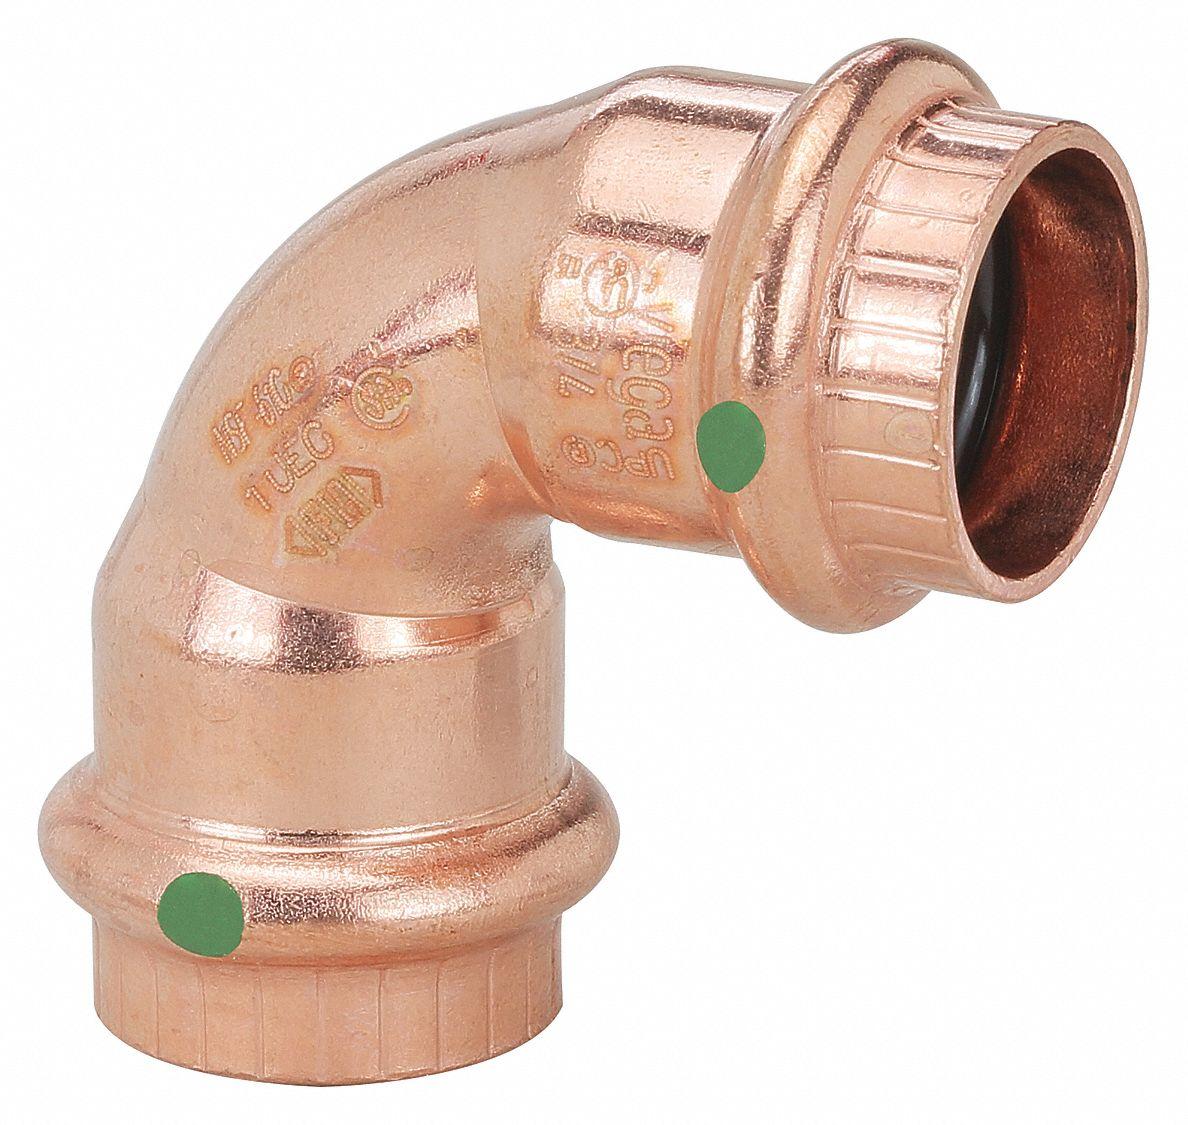 Viega Propress Copper 90 Degree Elbow Press X Press Connection